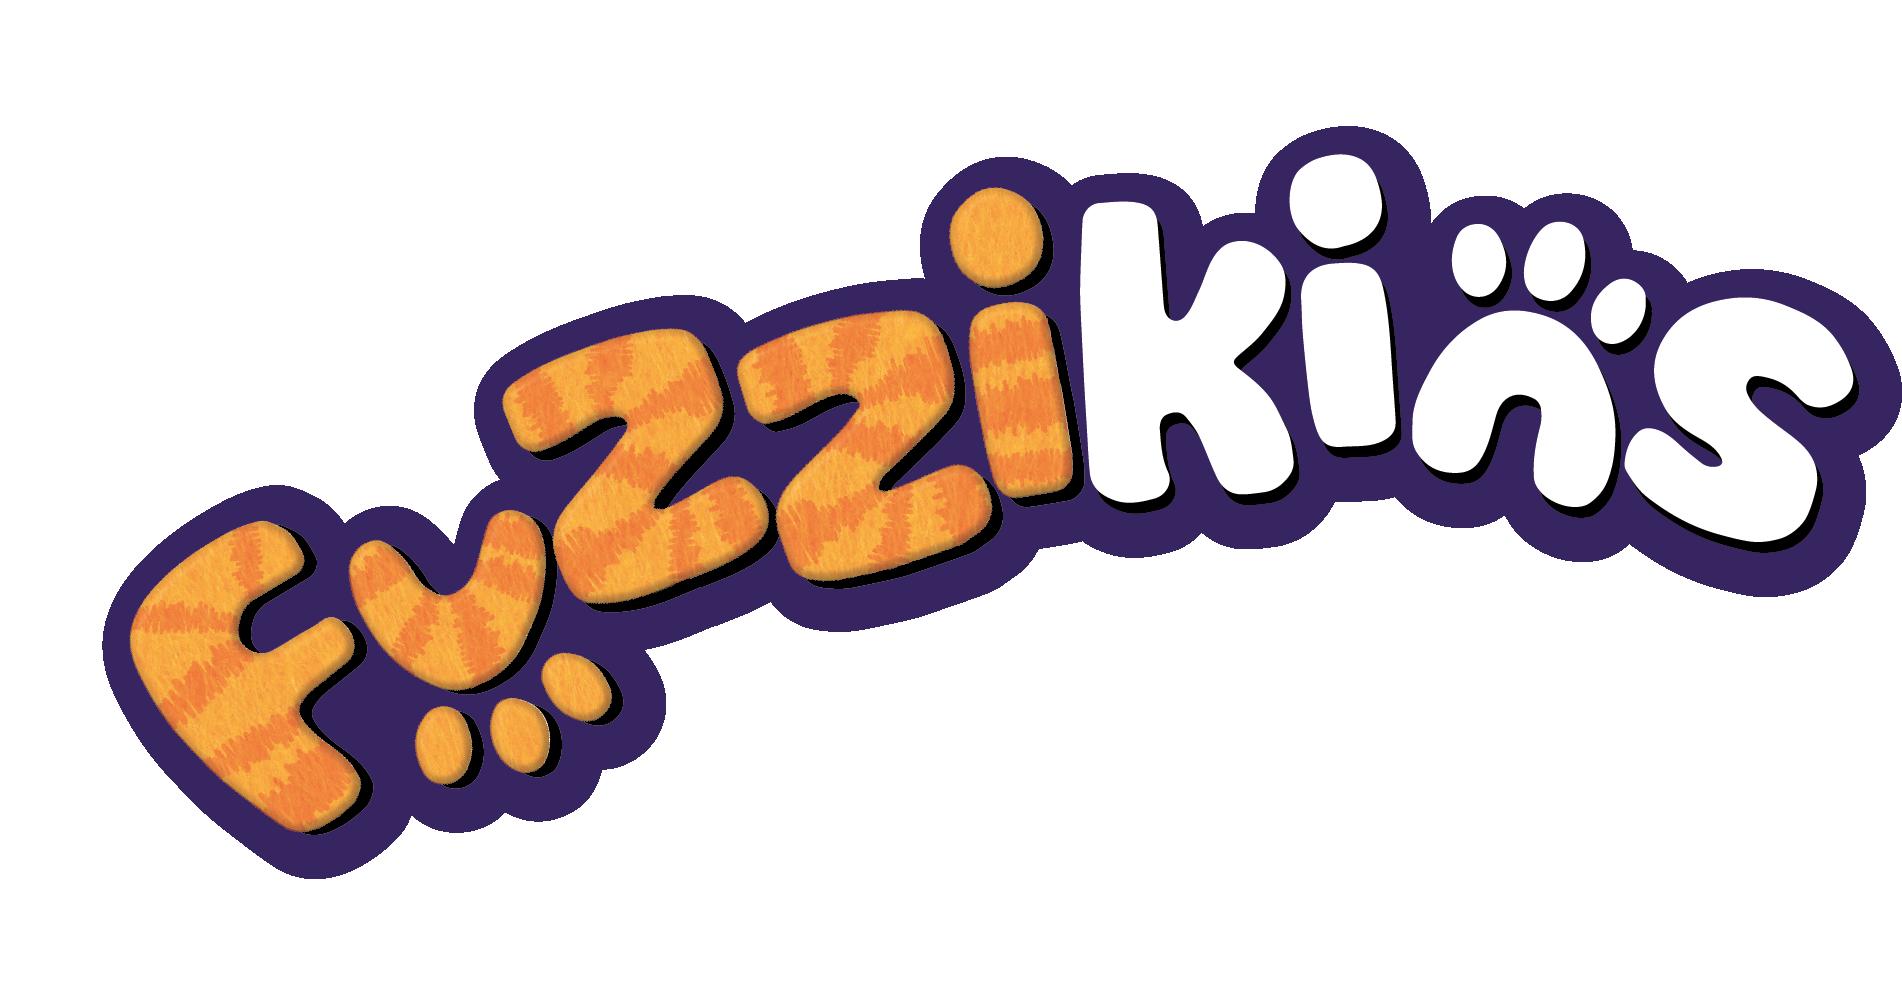 Fuzzikins logo